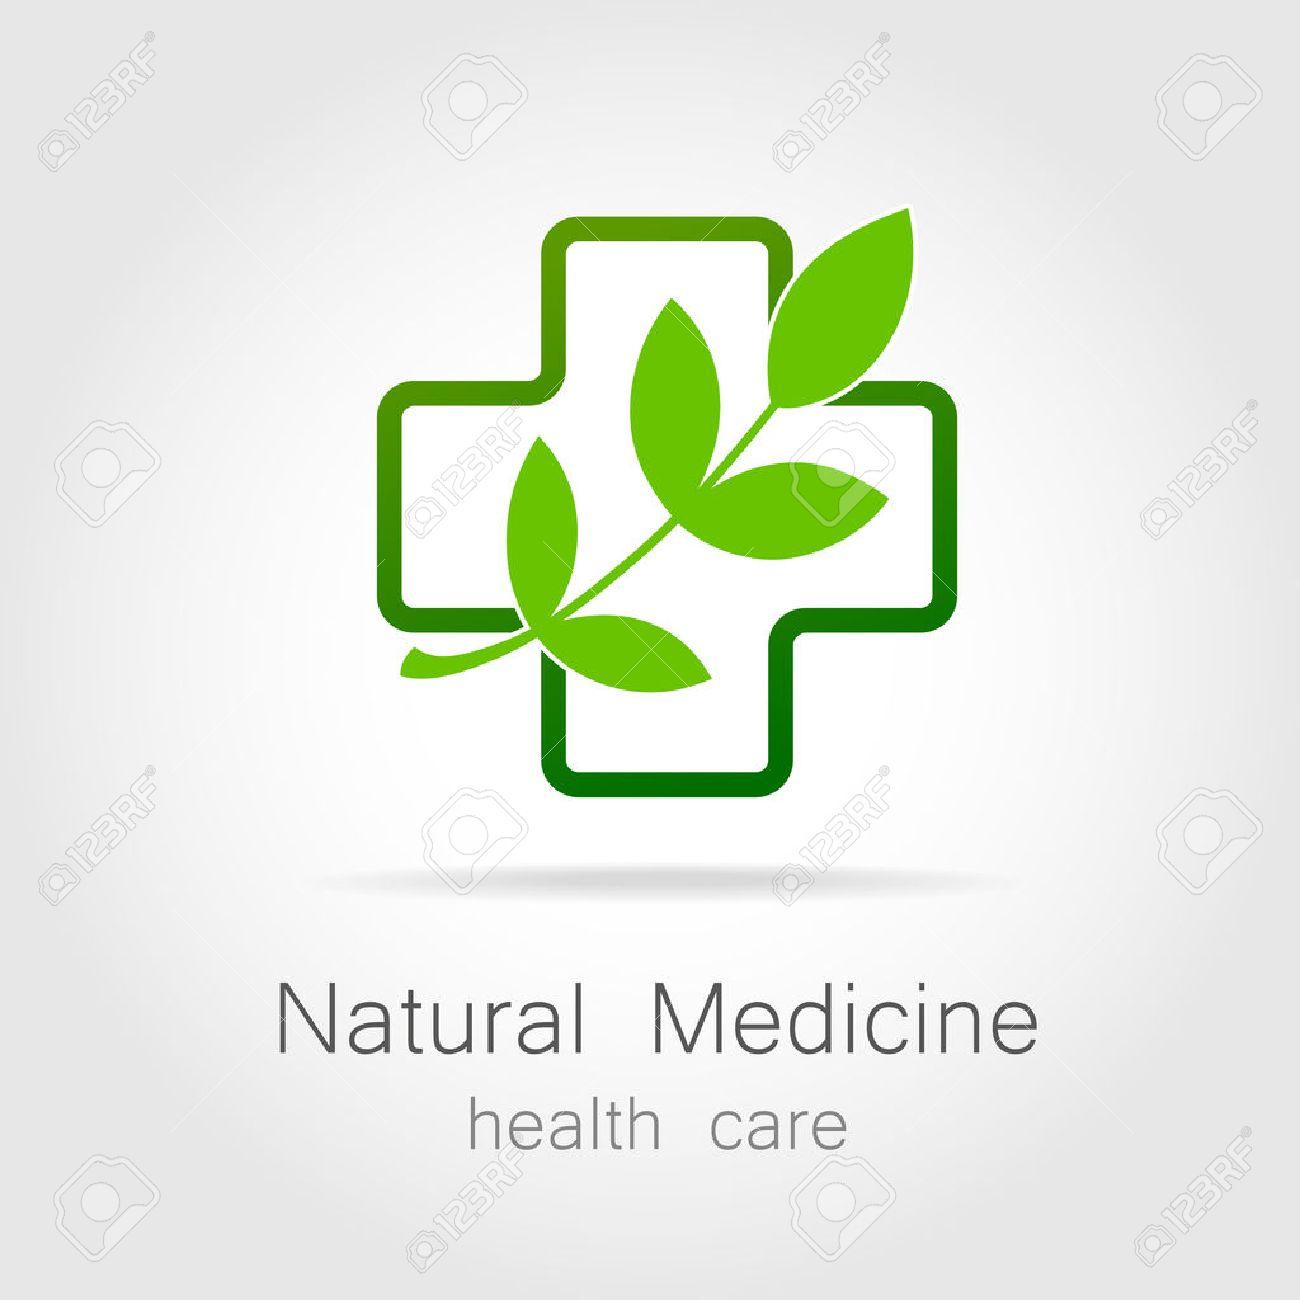 Natural medicine - a sign of eco bio treatment. Template for logotype alternative medicine, eco medicines, bio supplements, homeopathy, etc. - 43027026